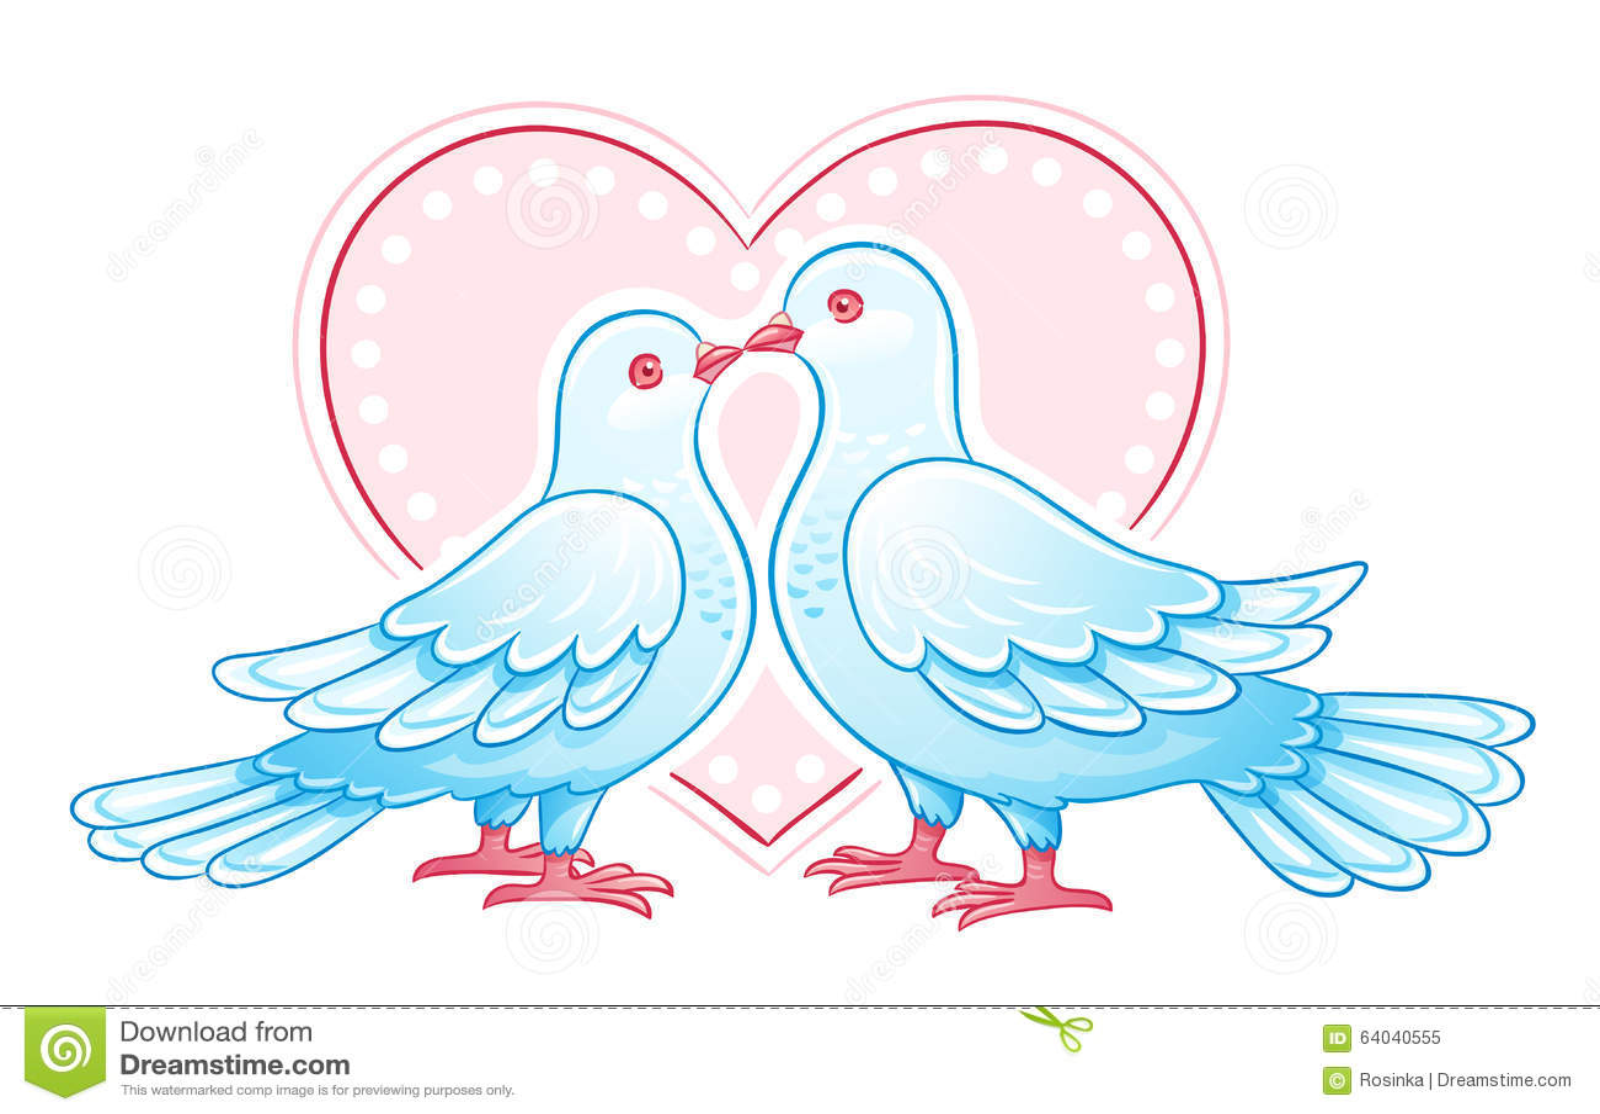 Stylized Doves On Fence Vector Illustration